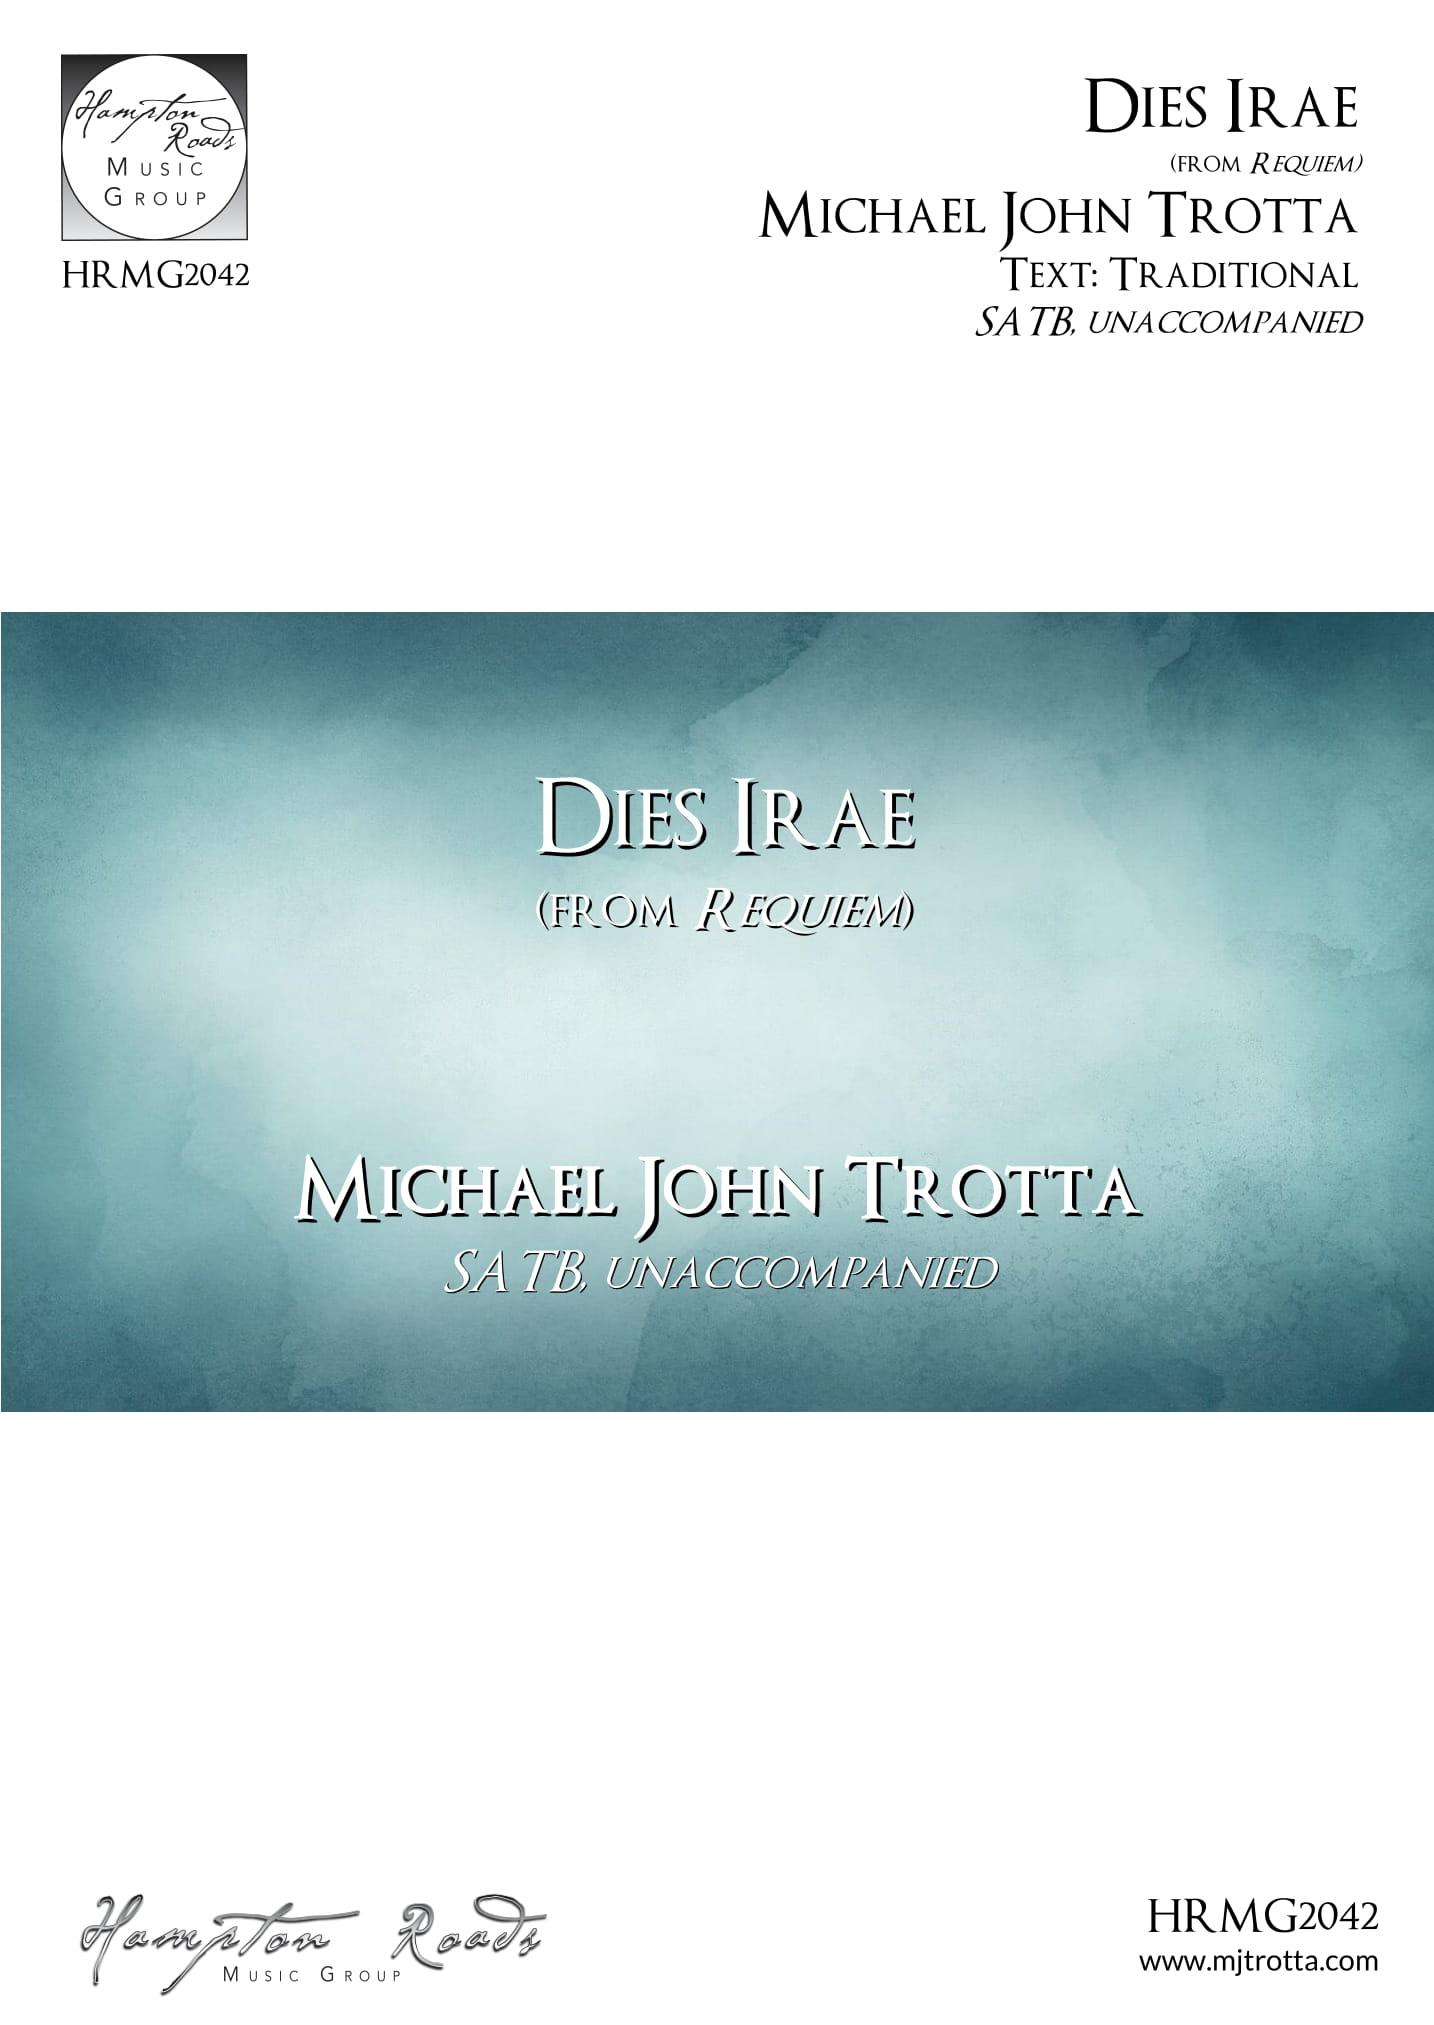 Dies Irae Michael John Trotta